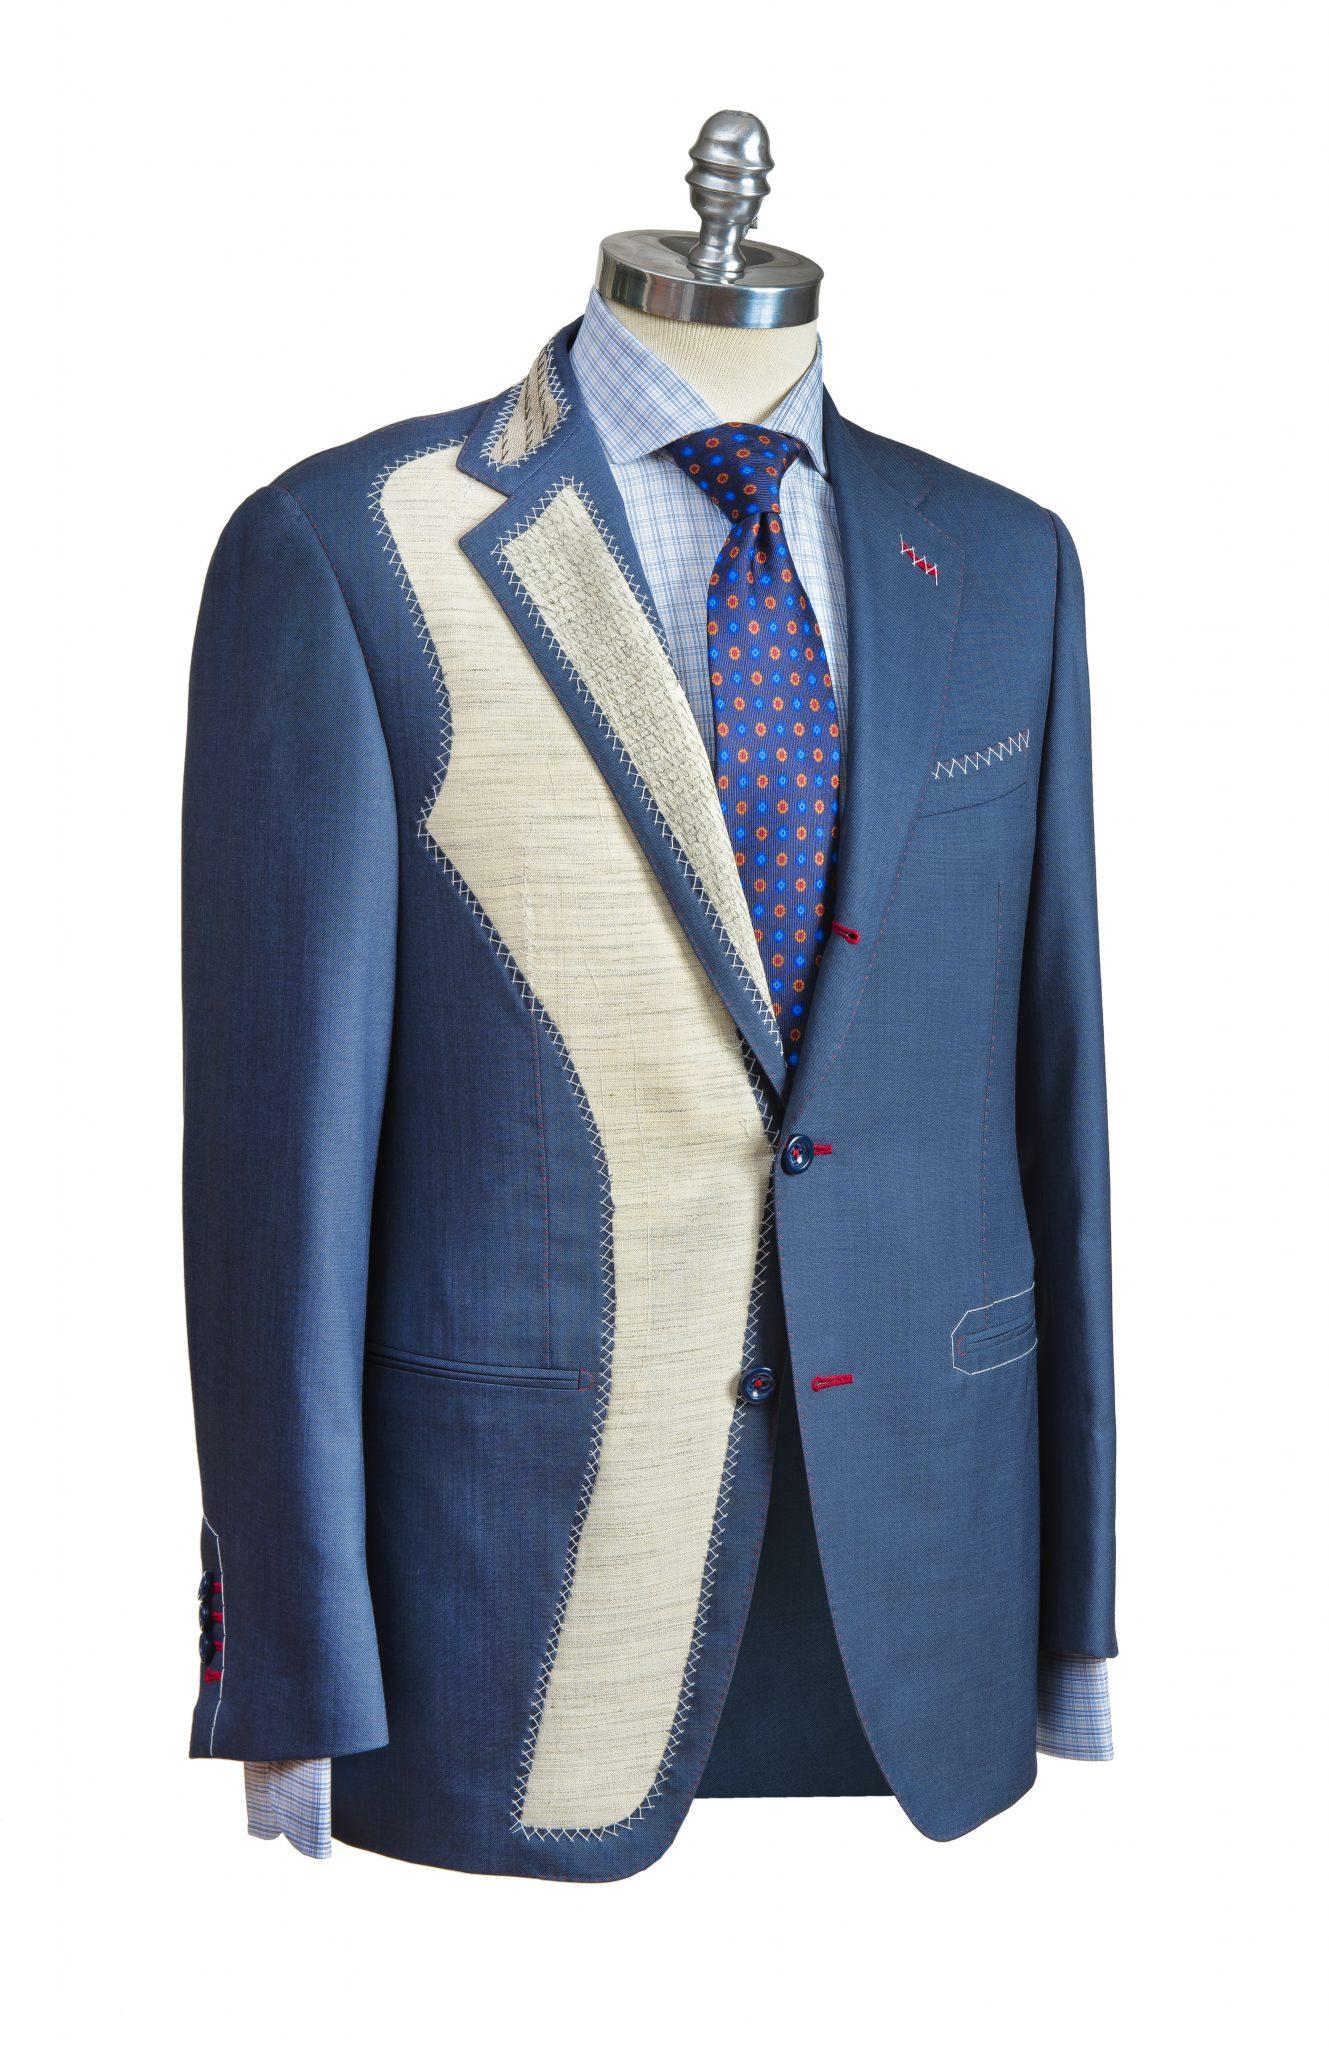 Custom-made suit